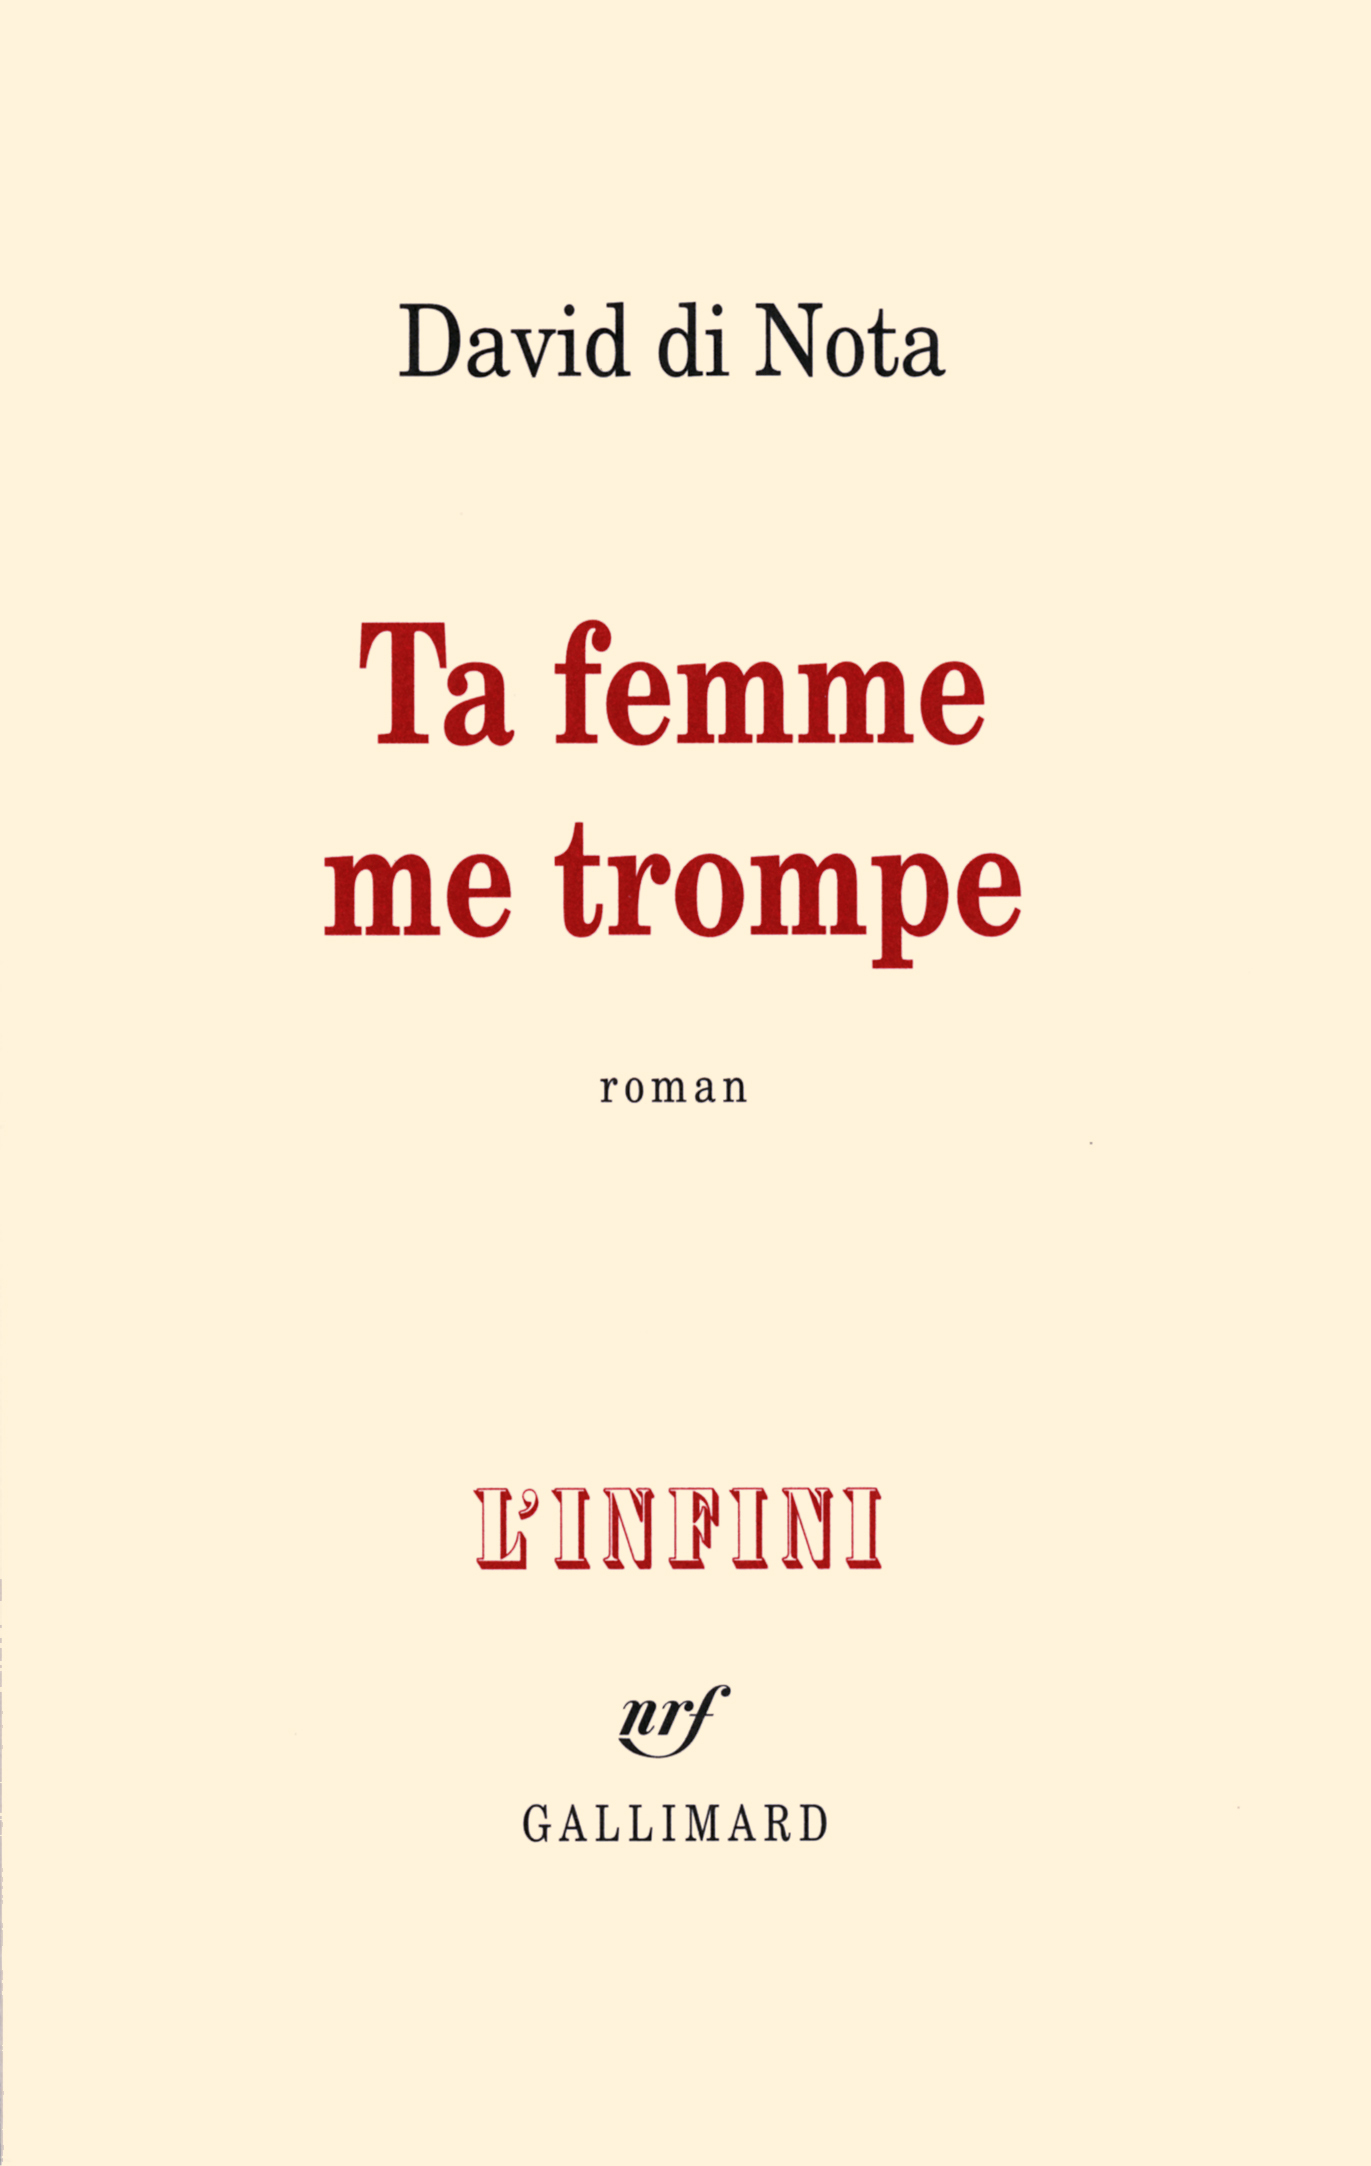 TA FEMME ME TROMPE ROMAN